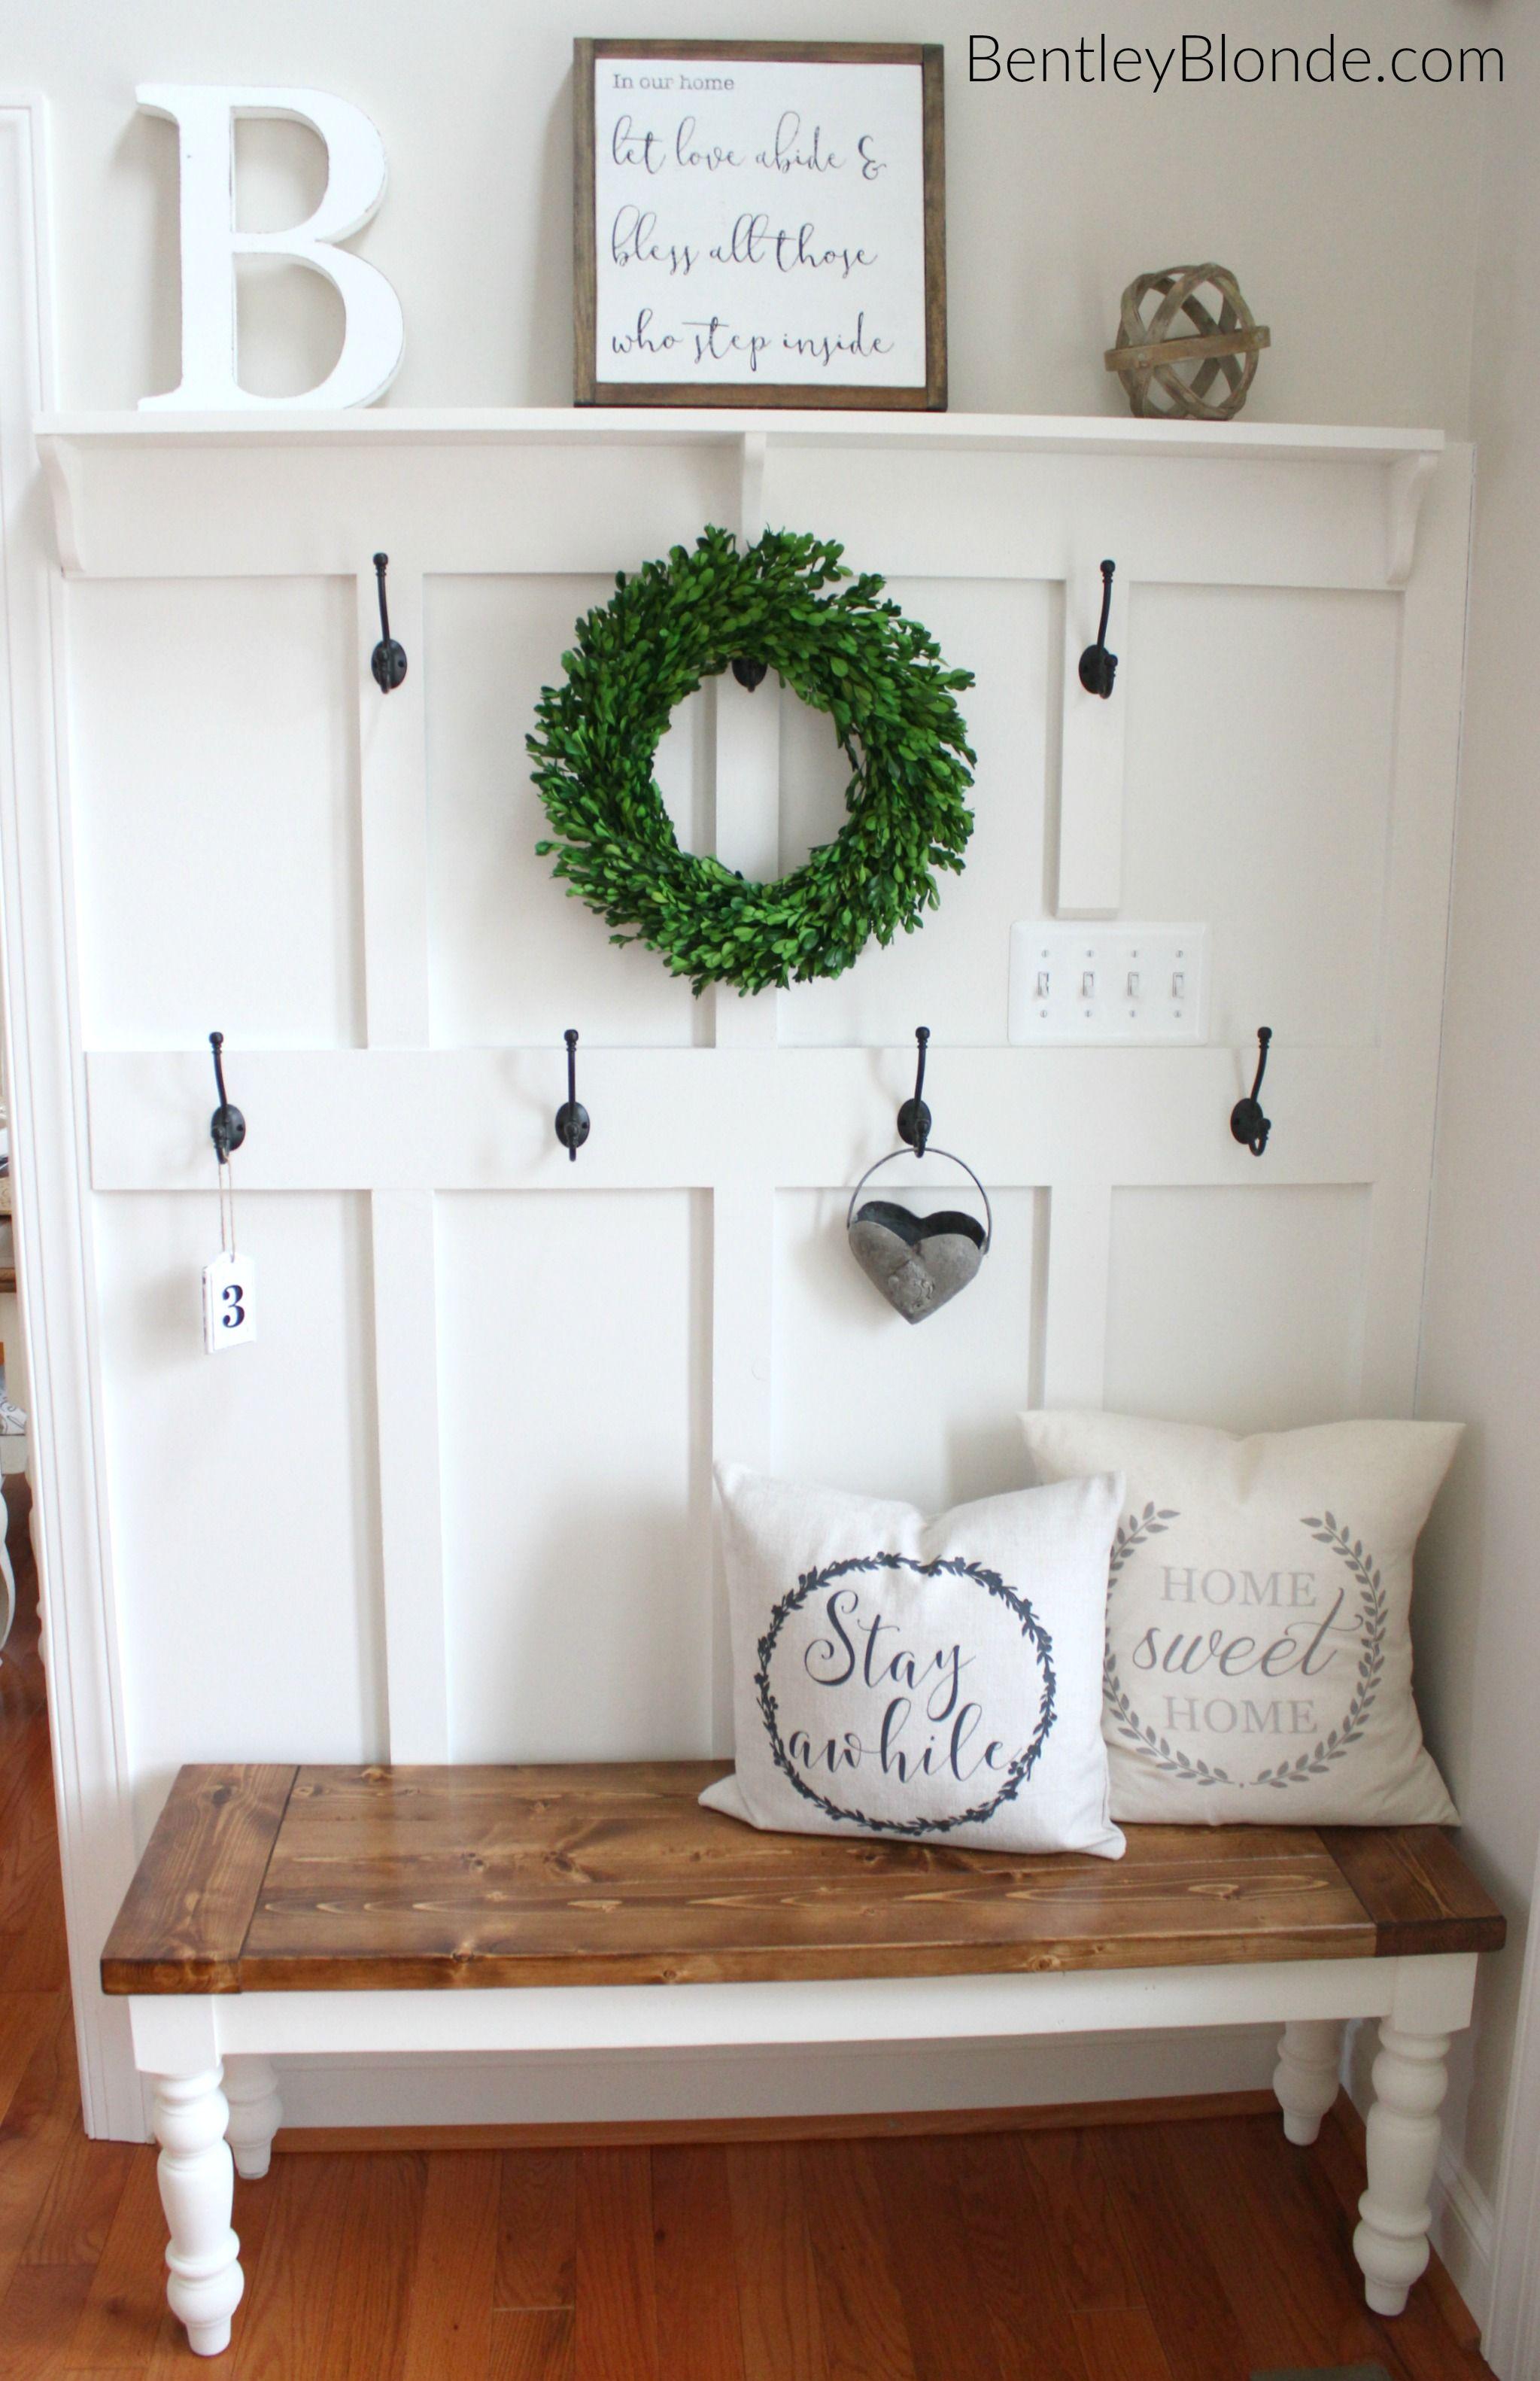 Diy farmhouse bench tutorial farmhouse style pinterest for Foyer seating ideas